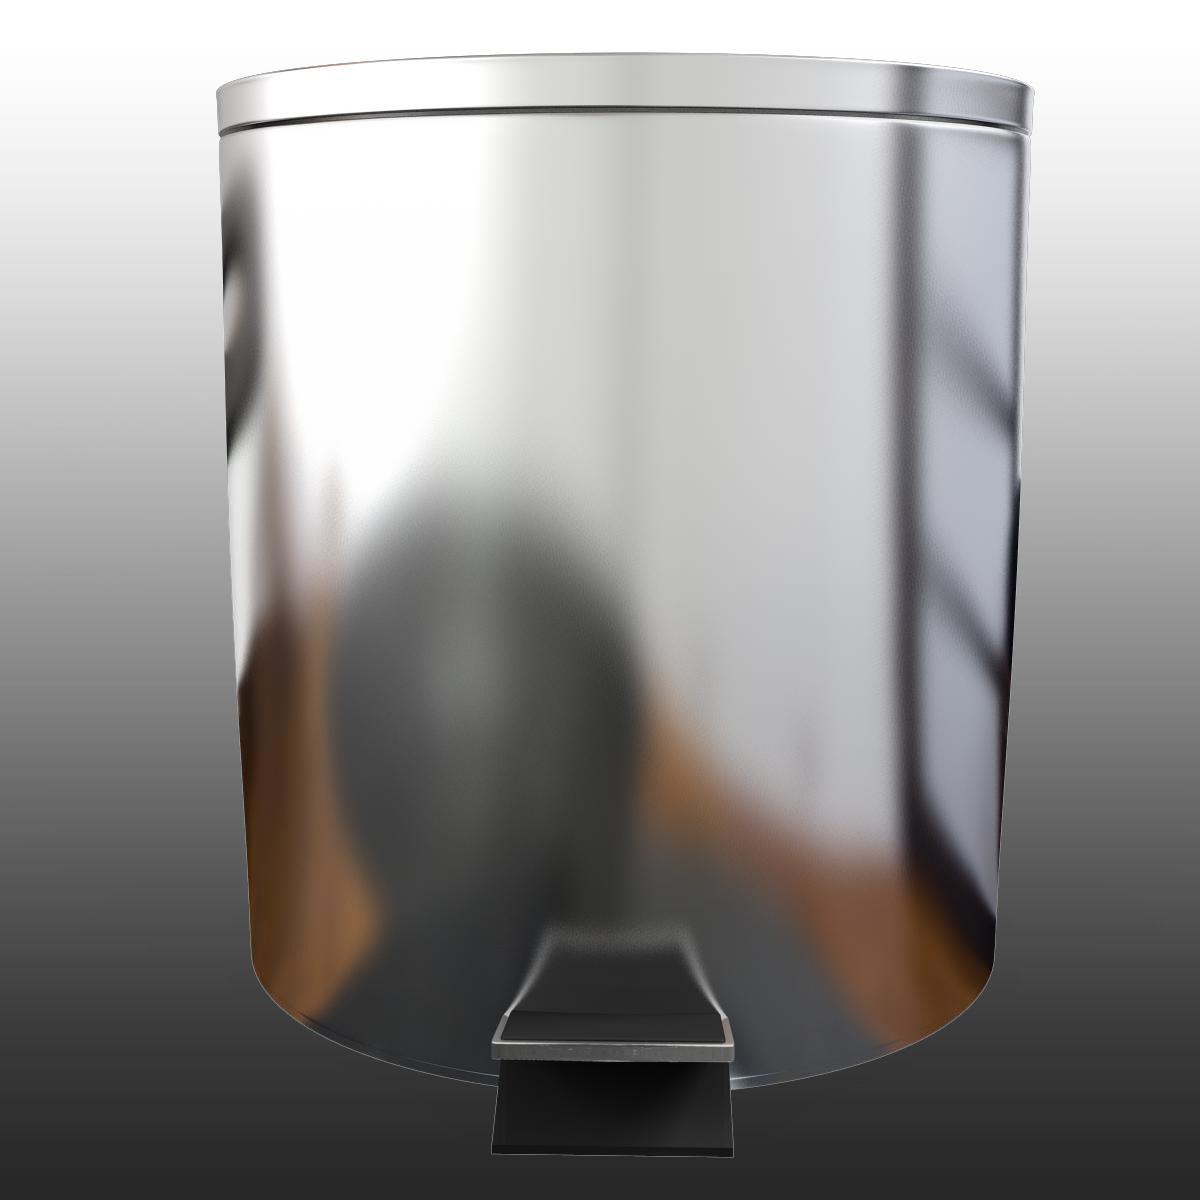 bathroom dumpster 3d model 3ds max fbx ma mb obj 155980